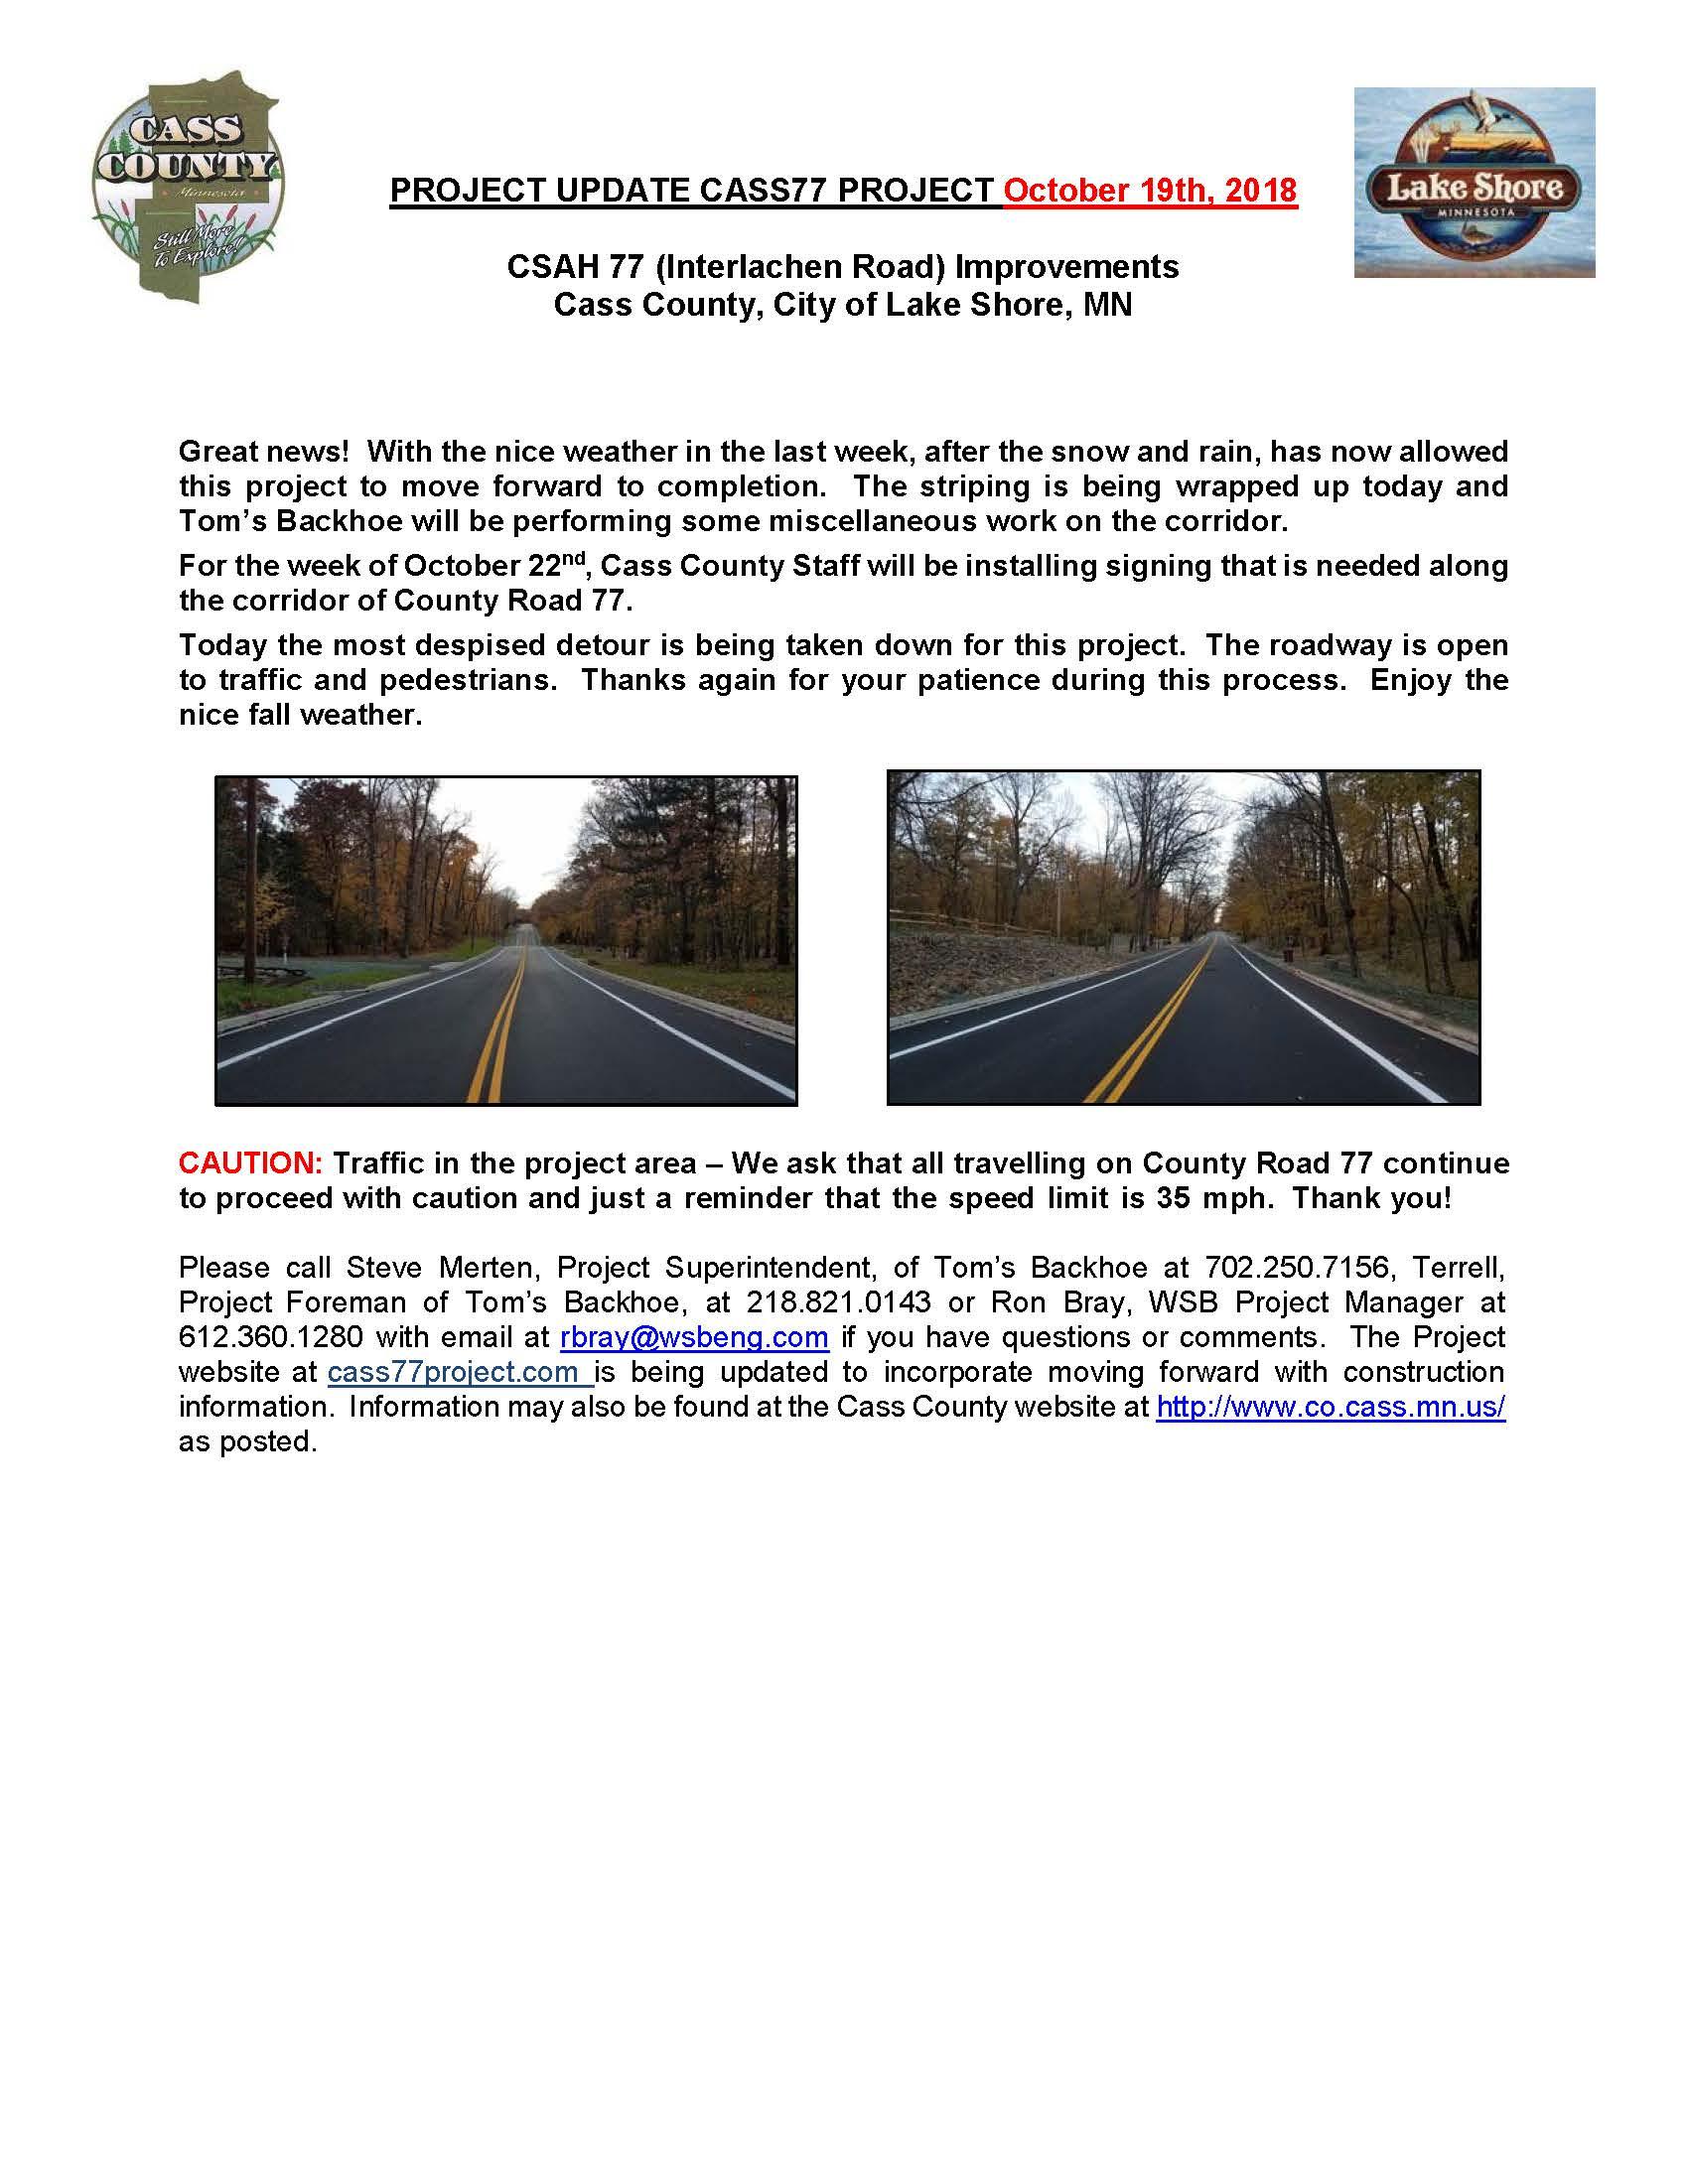 Cass County CSAH 77 Project update October 19th 2018.jpg